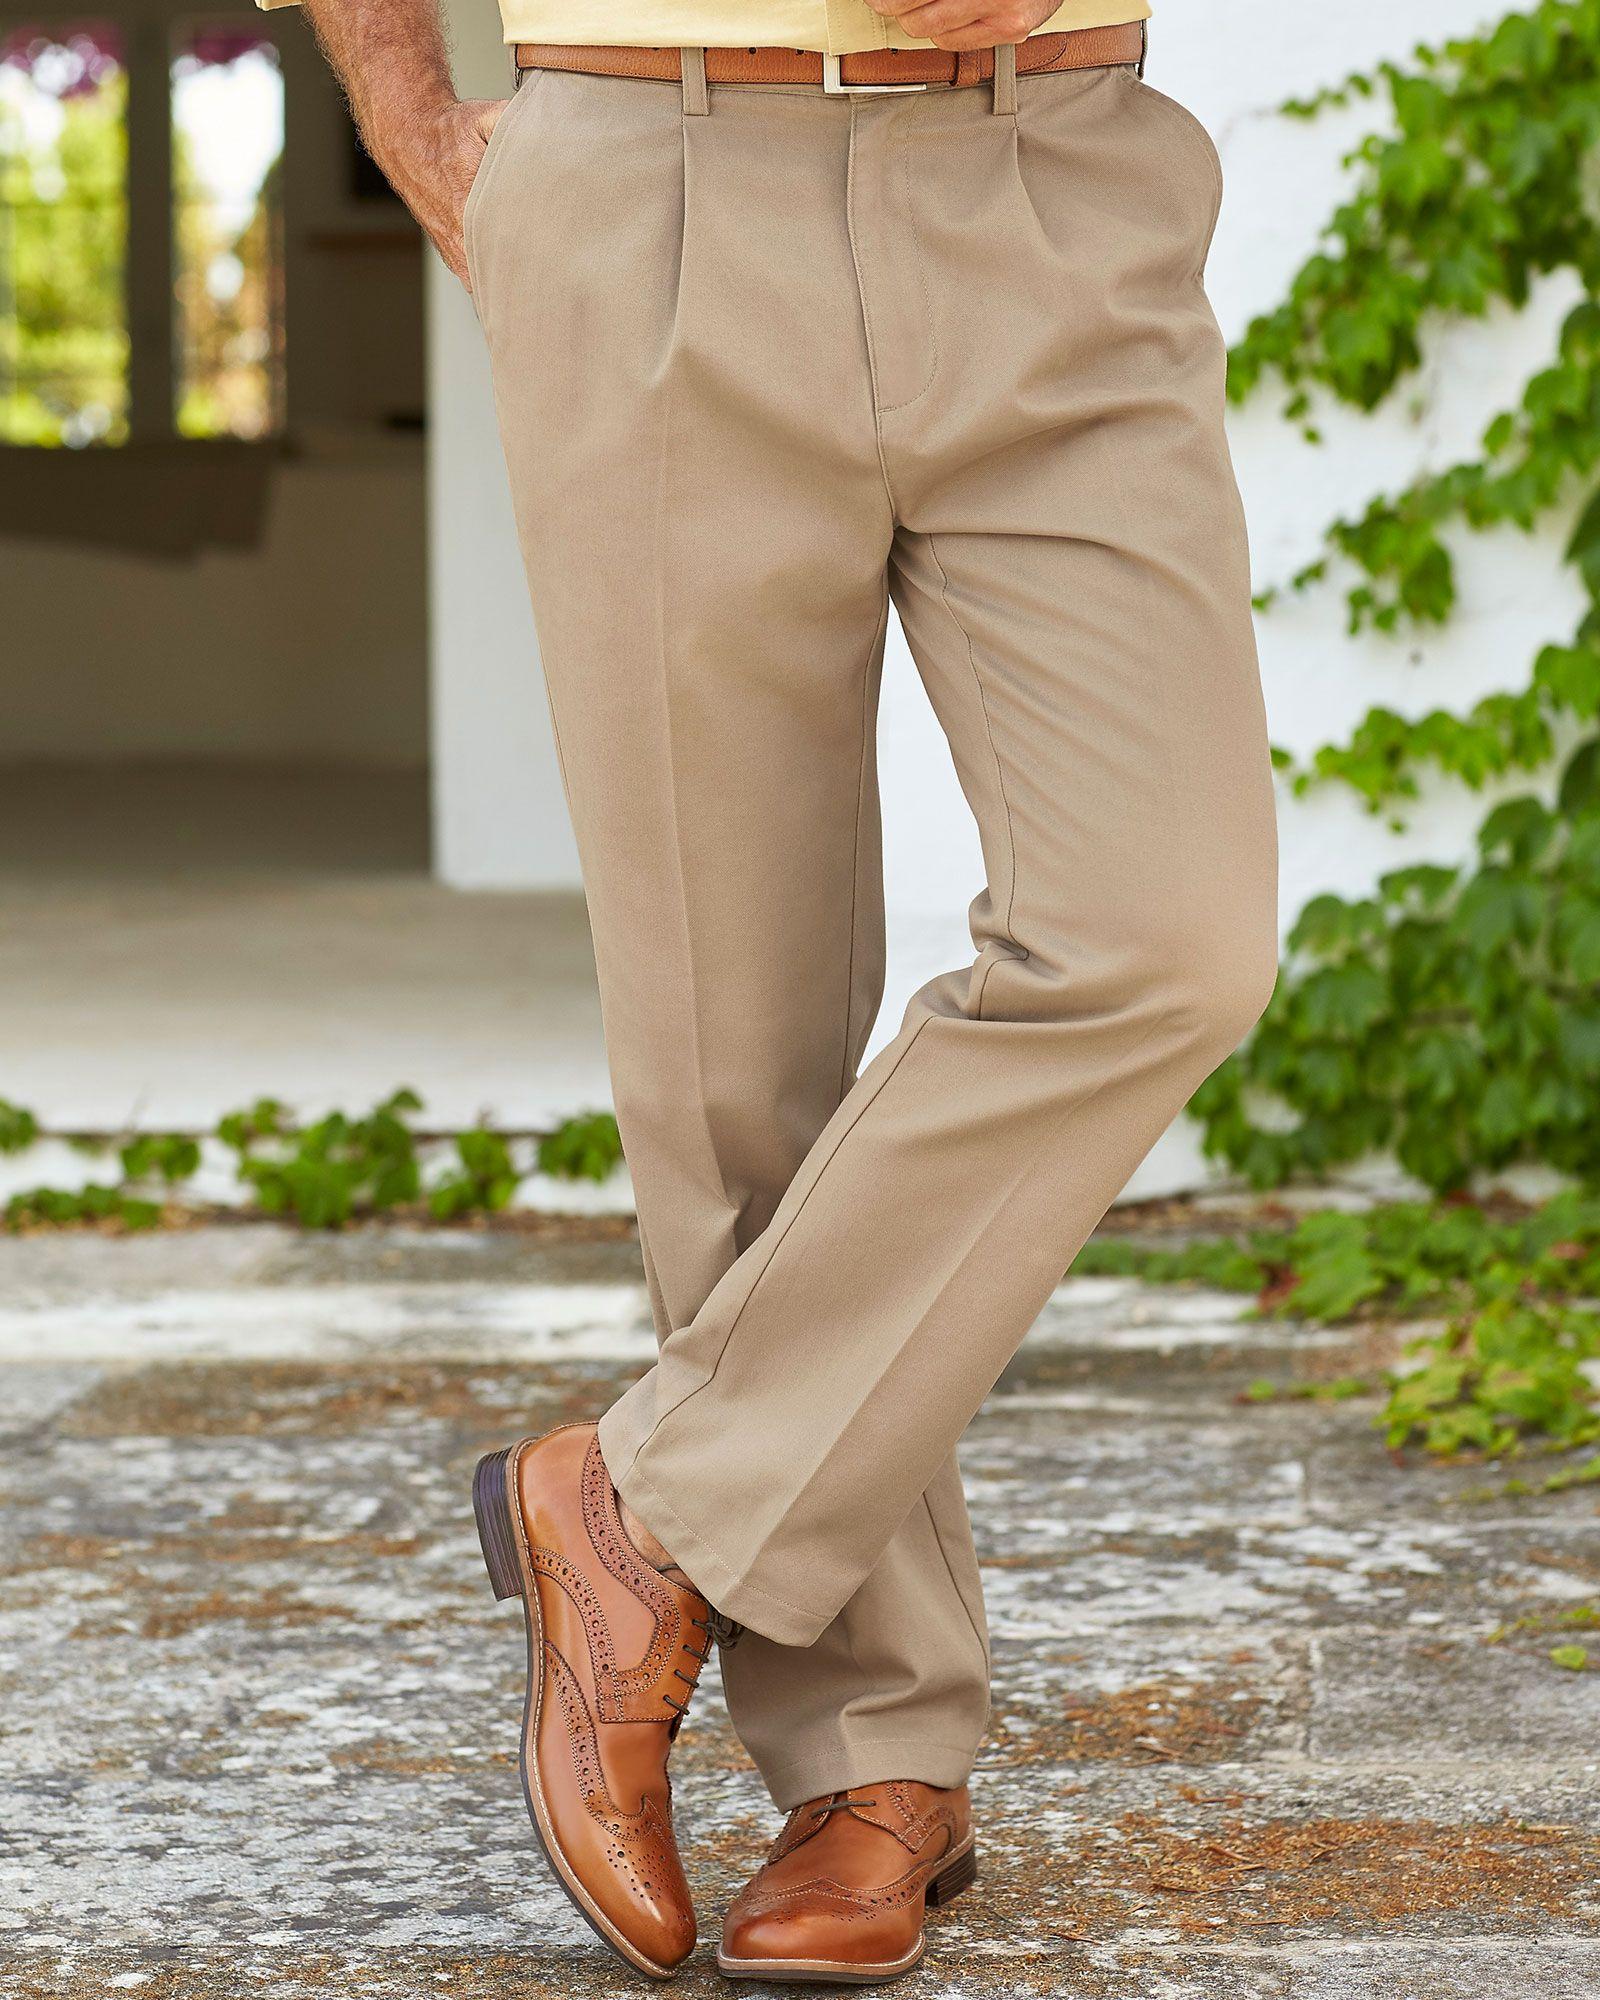 Men's Trousers | Men's Shorts - Cotton Traders